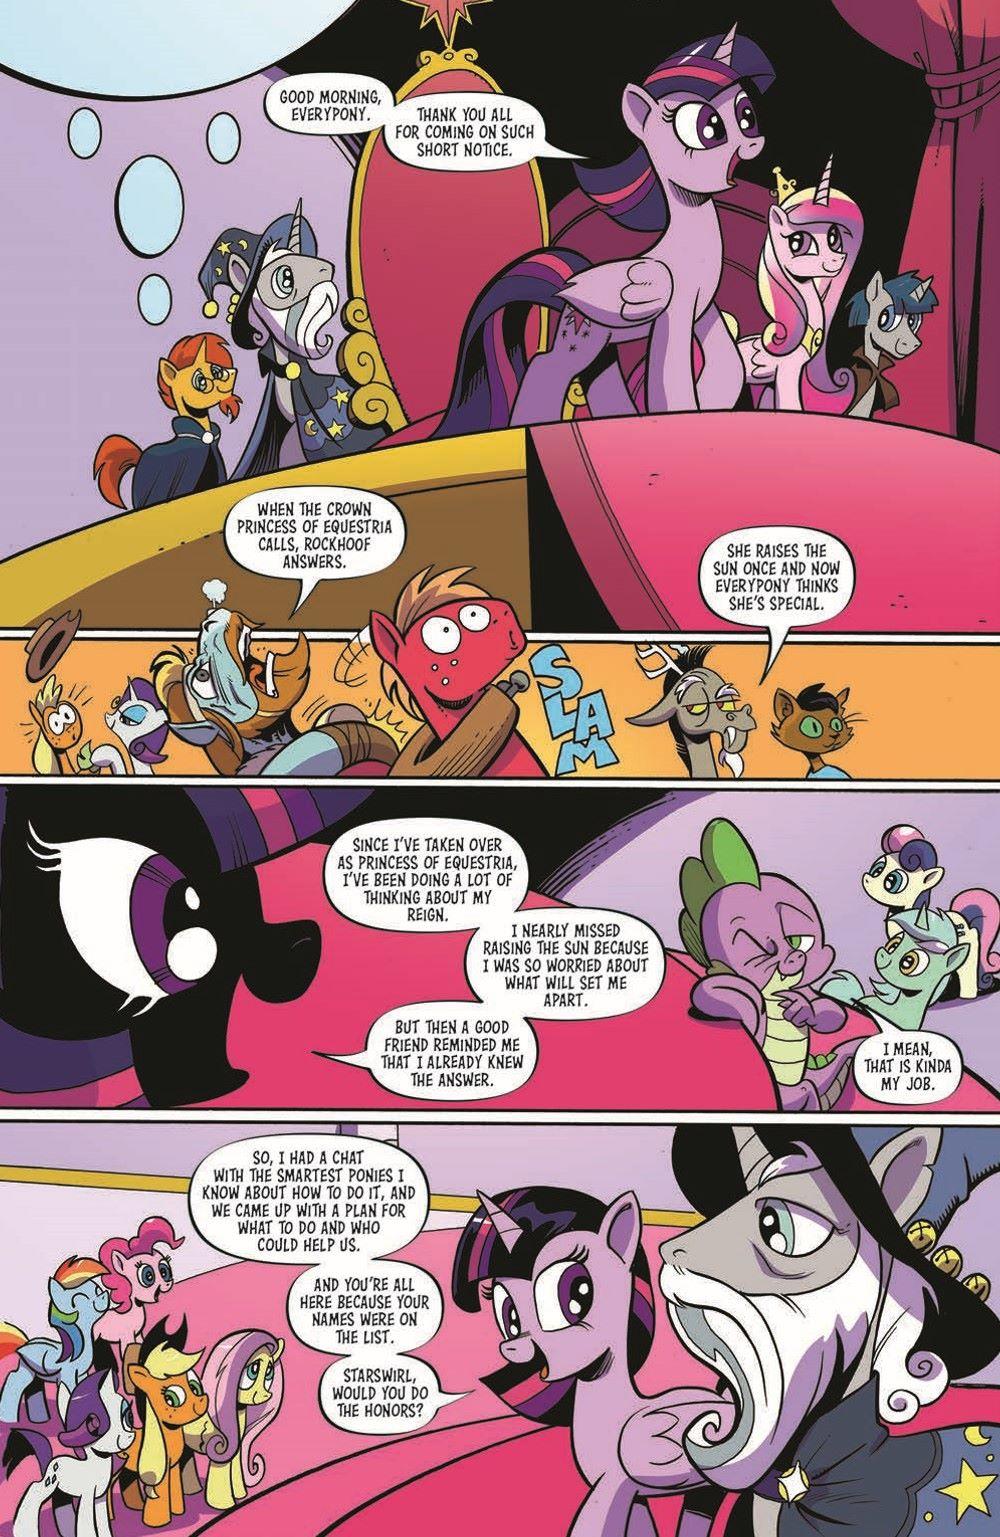 MLP_s10_v1_pr-6 ComicList Previews: MY LITTLE PONY FRIENDSHIP IS MAGIC SEASON 10 VOLUME 1 TP